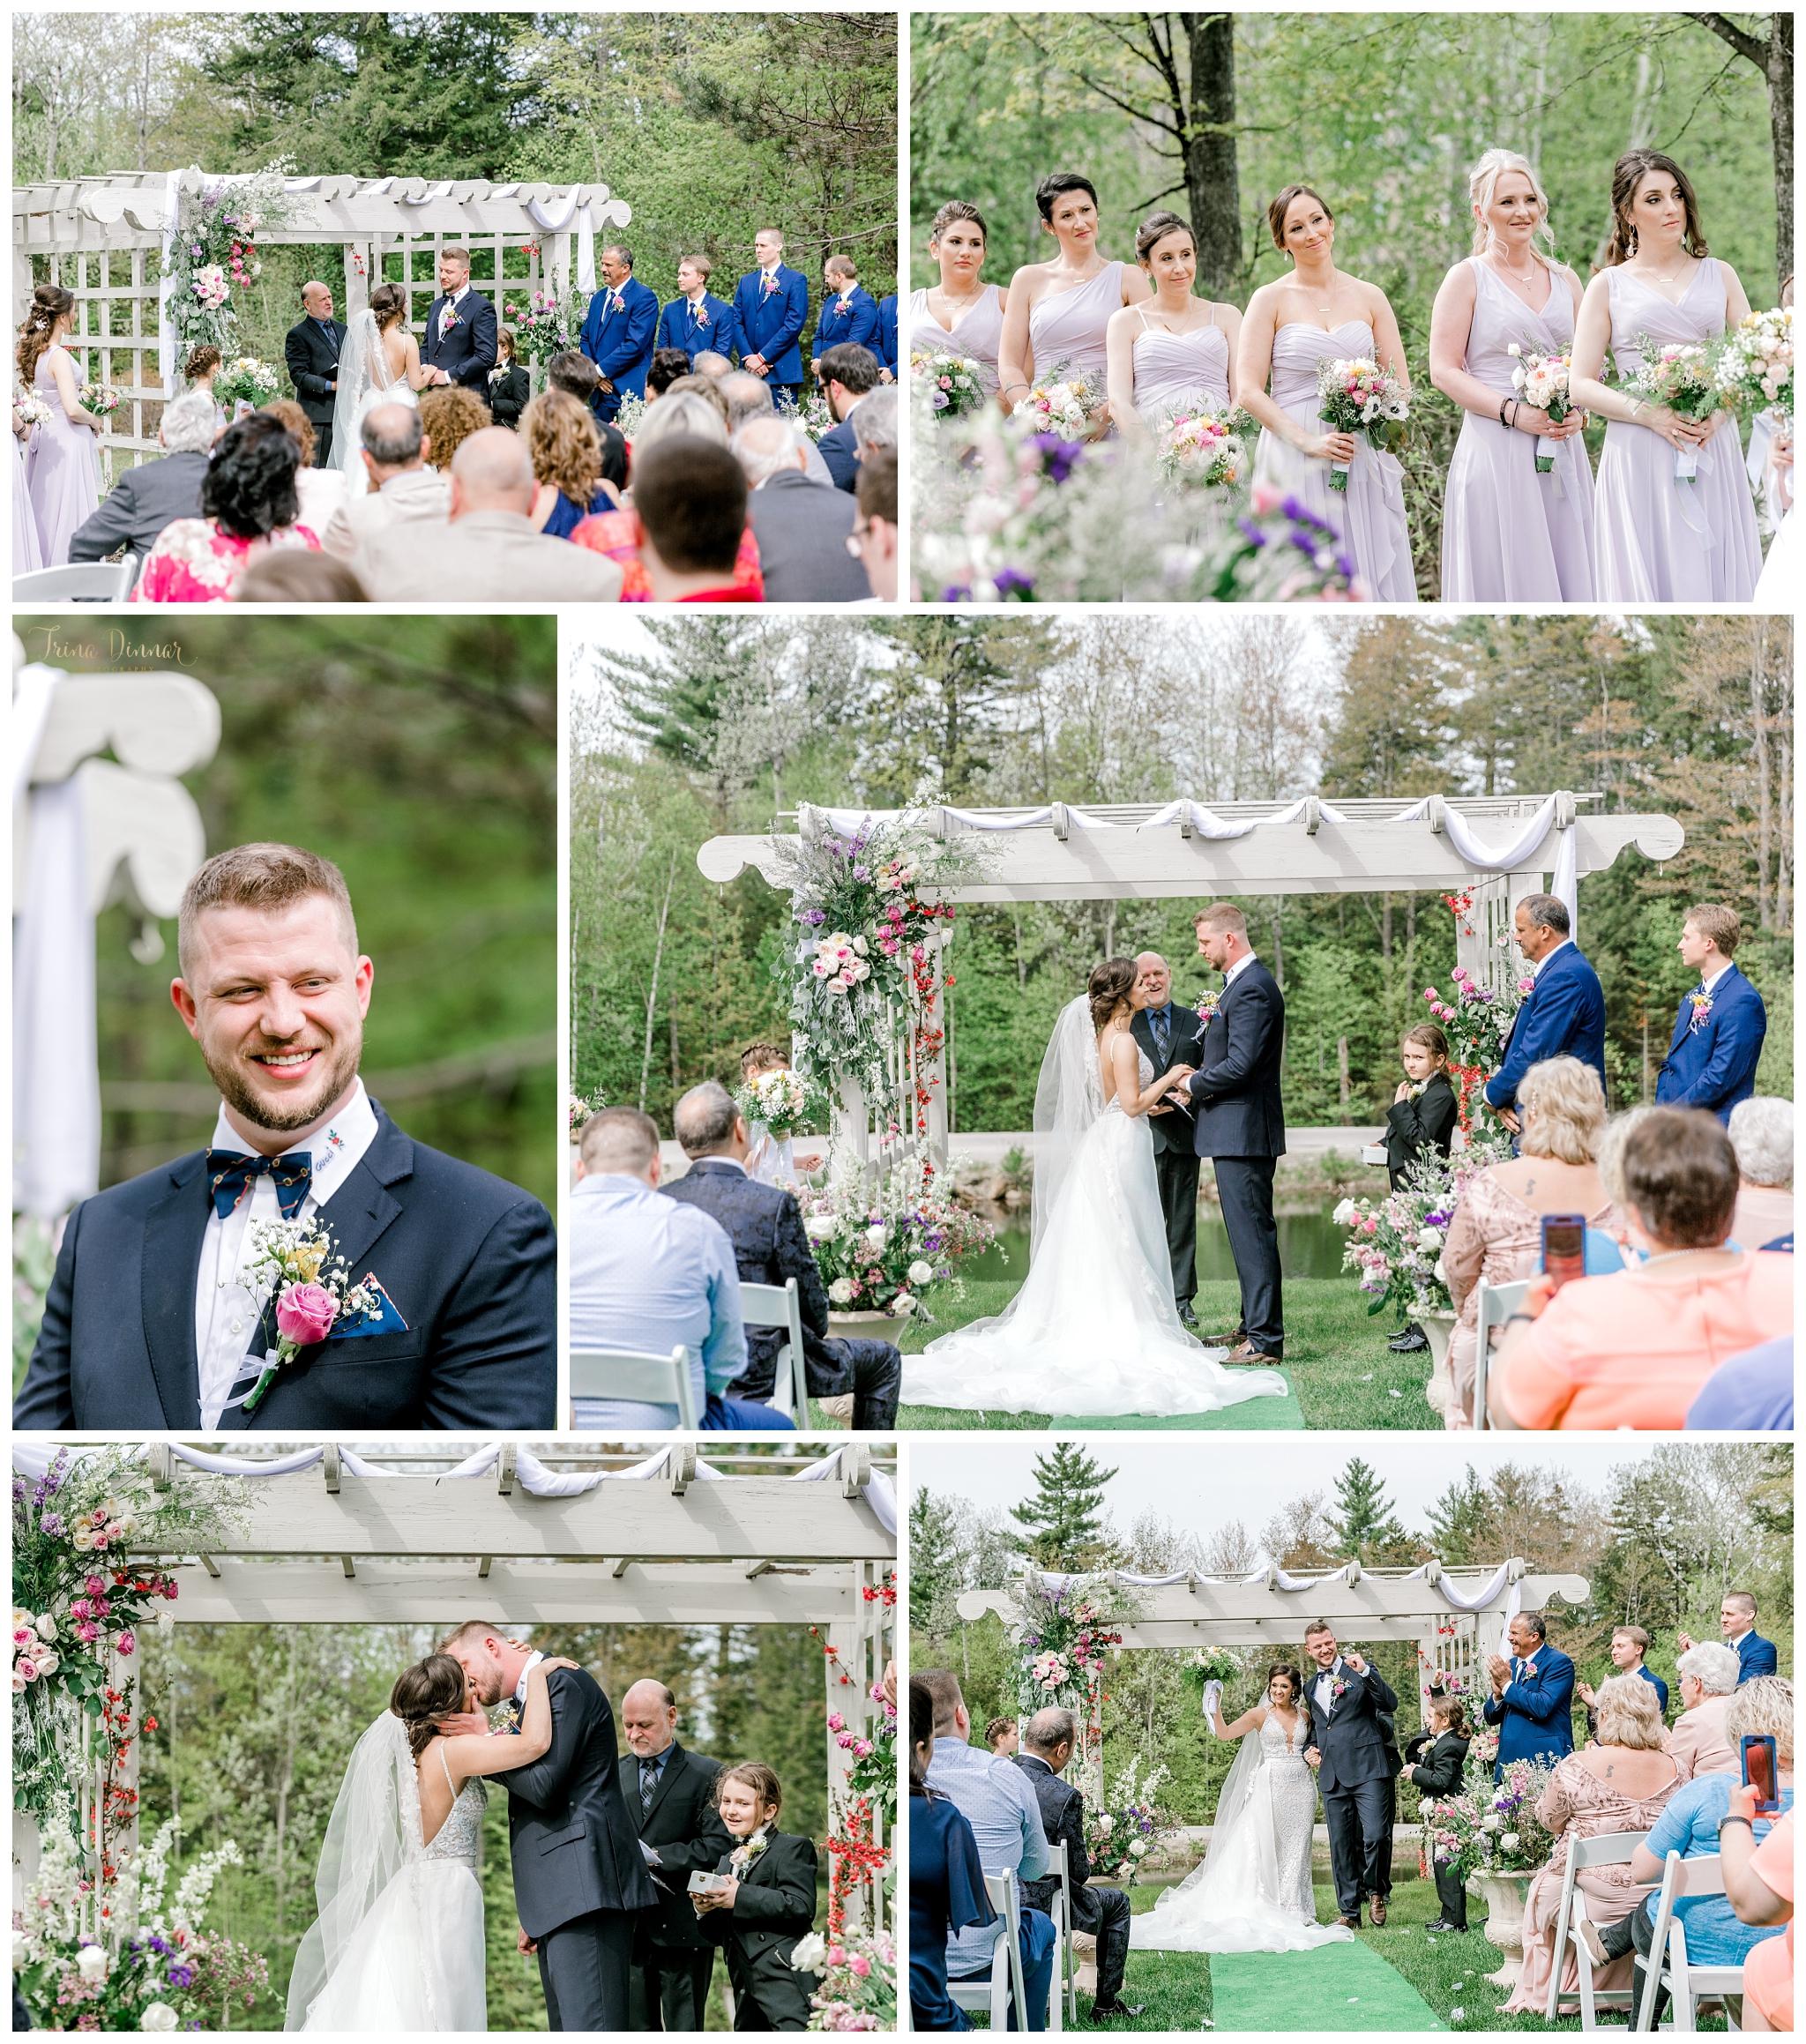 Wedding Ceremony at Grand Summit Hotel Newry Maine